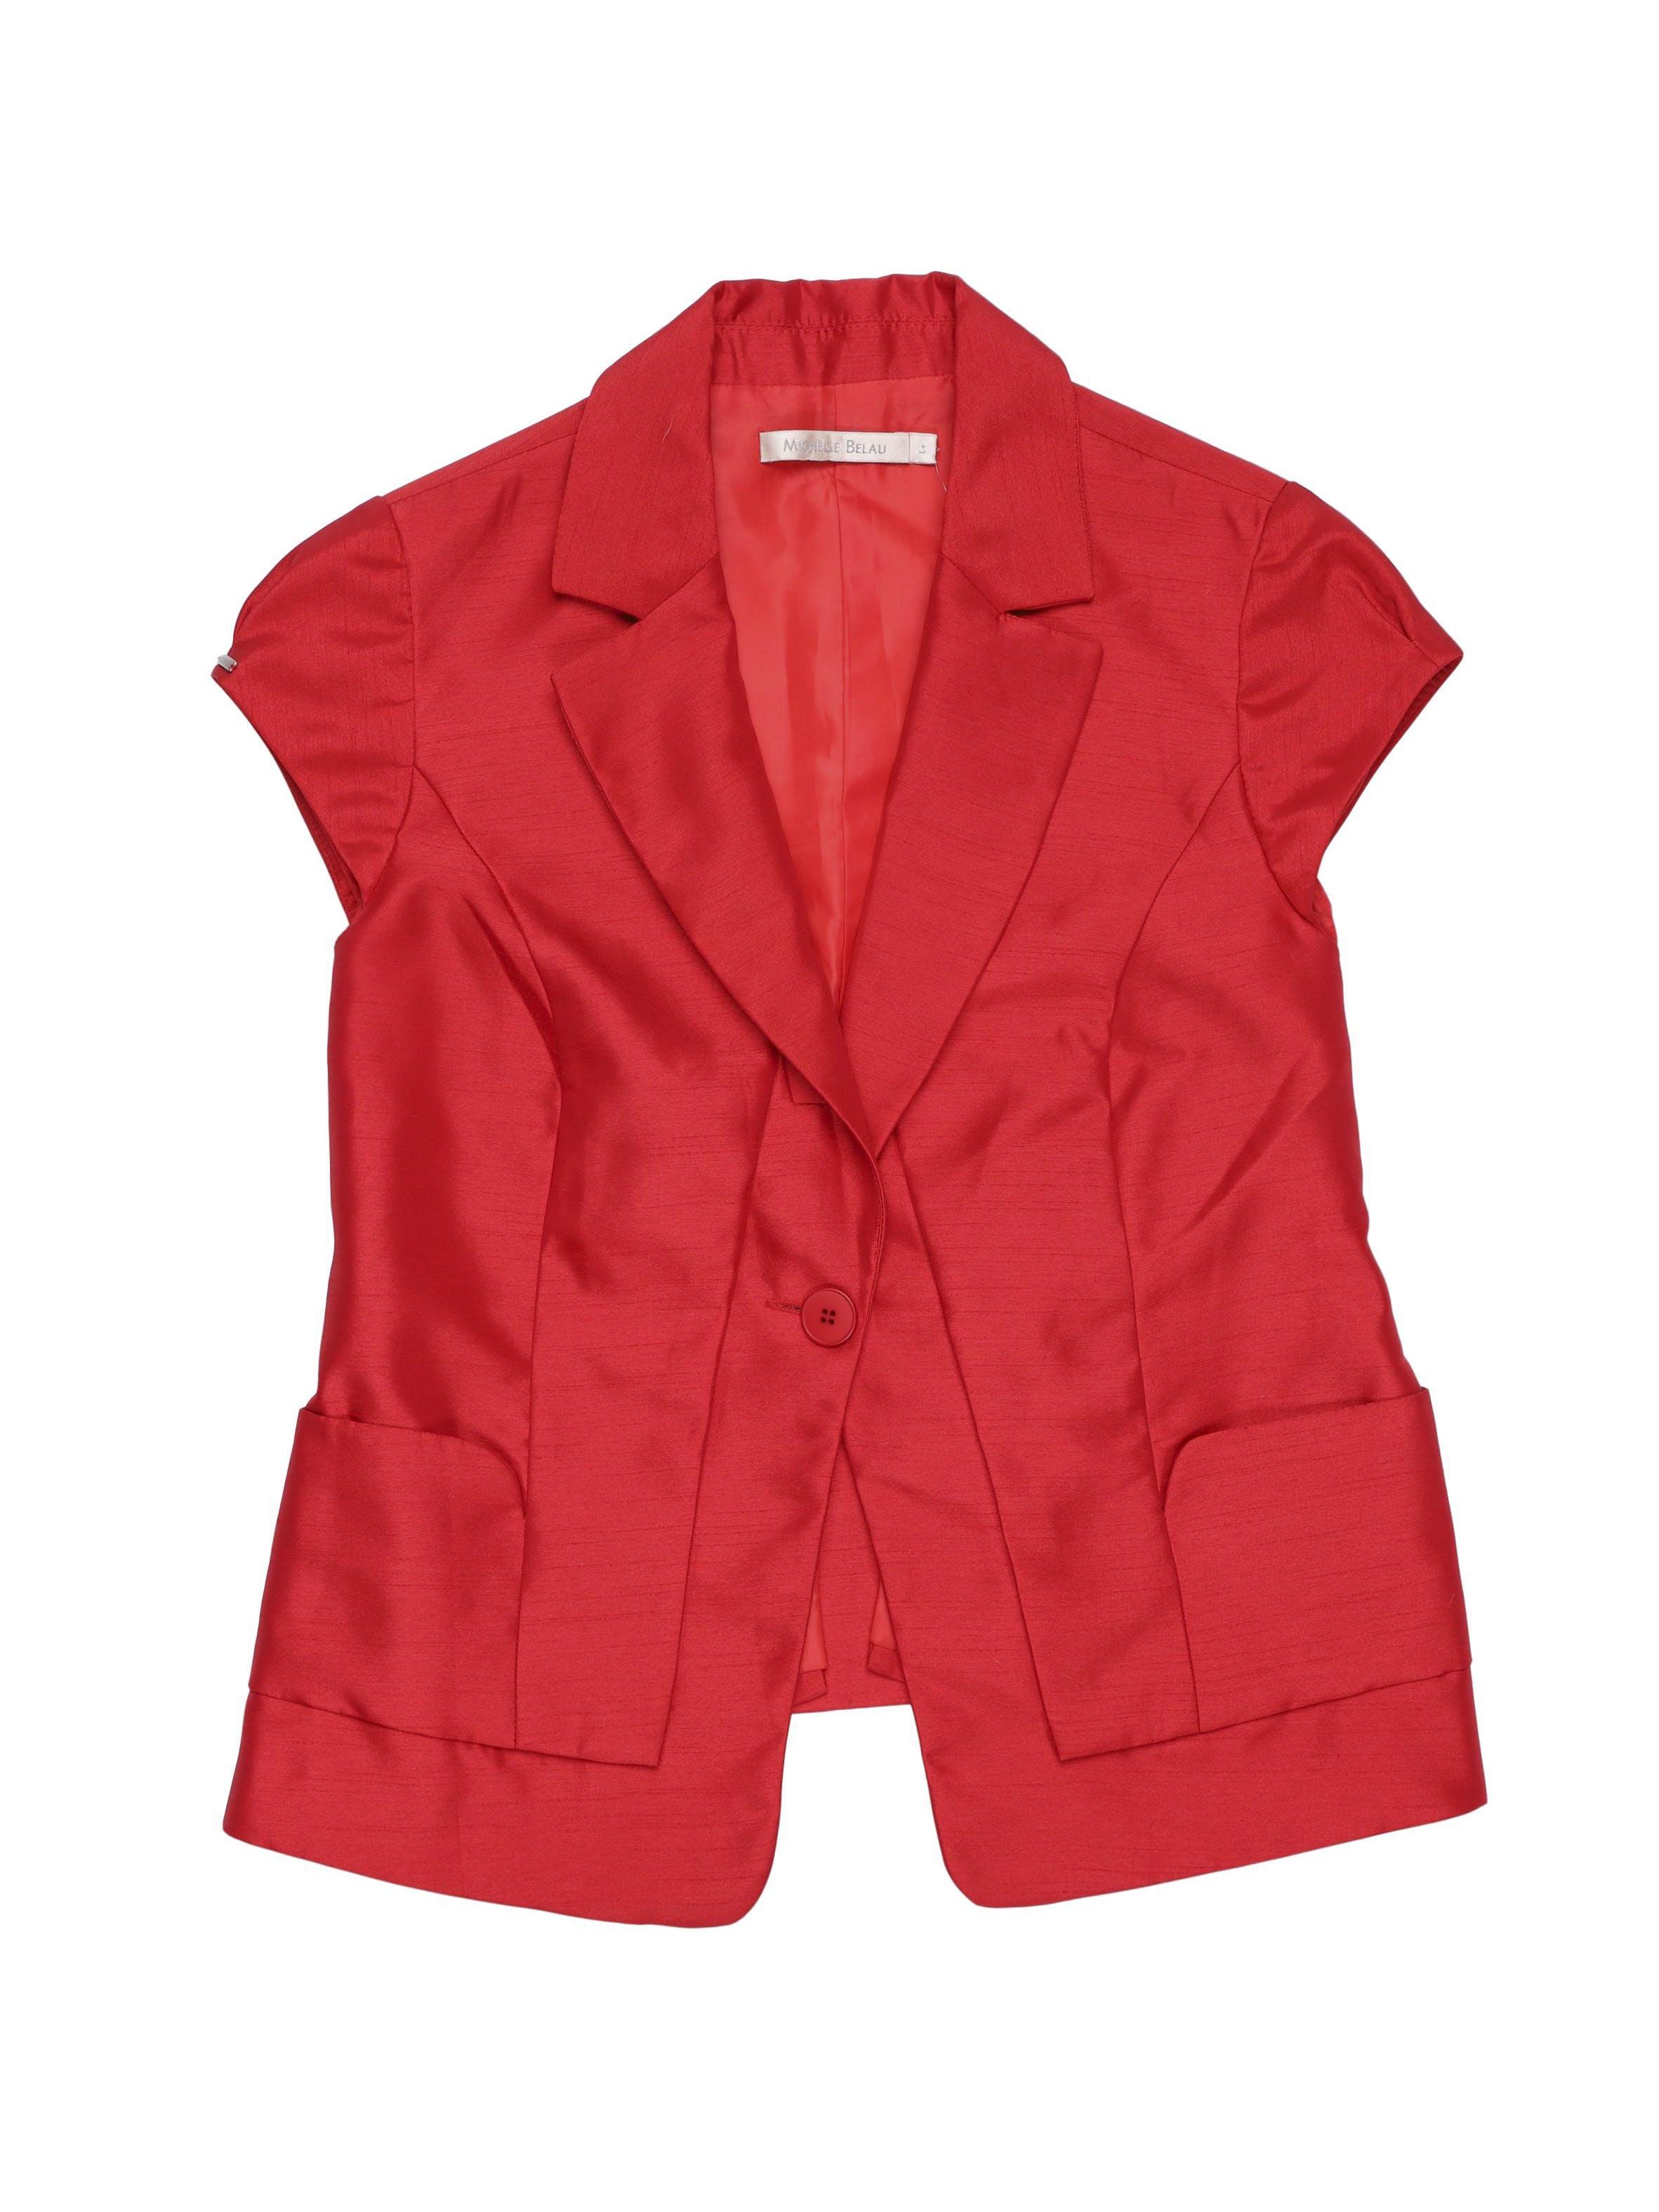 Blazer rojo Michelle Belau, con solapa, 1 botón, 2 bolsillos y forro